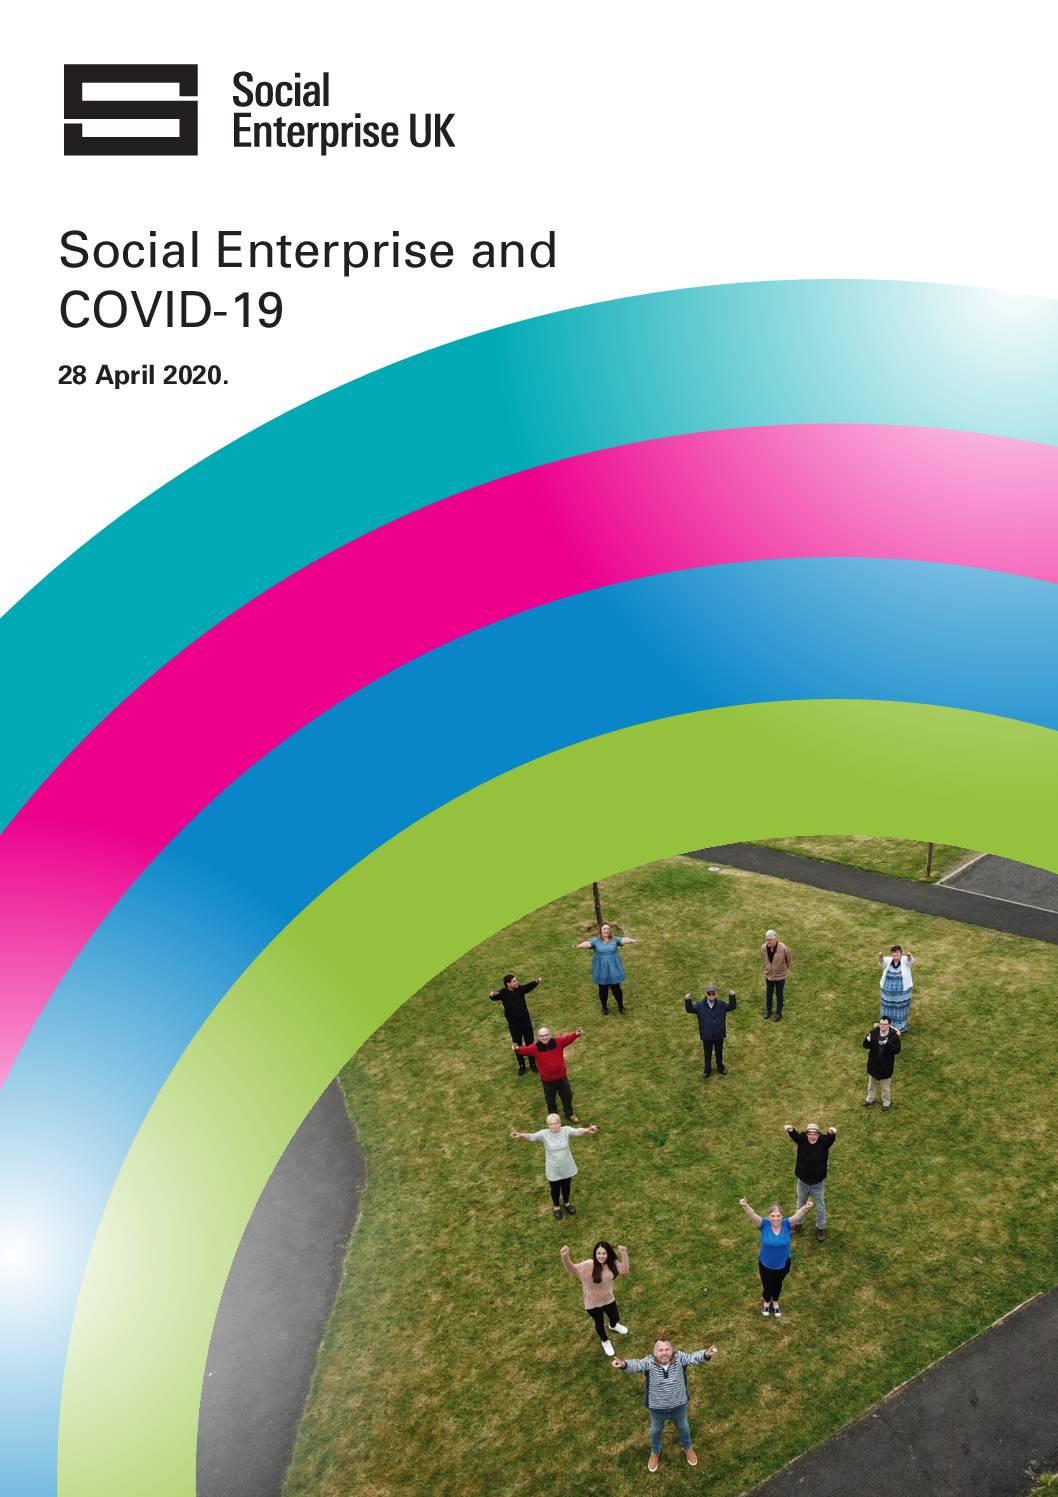 Social Enterprise and COVID-19